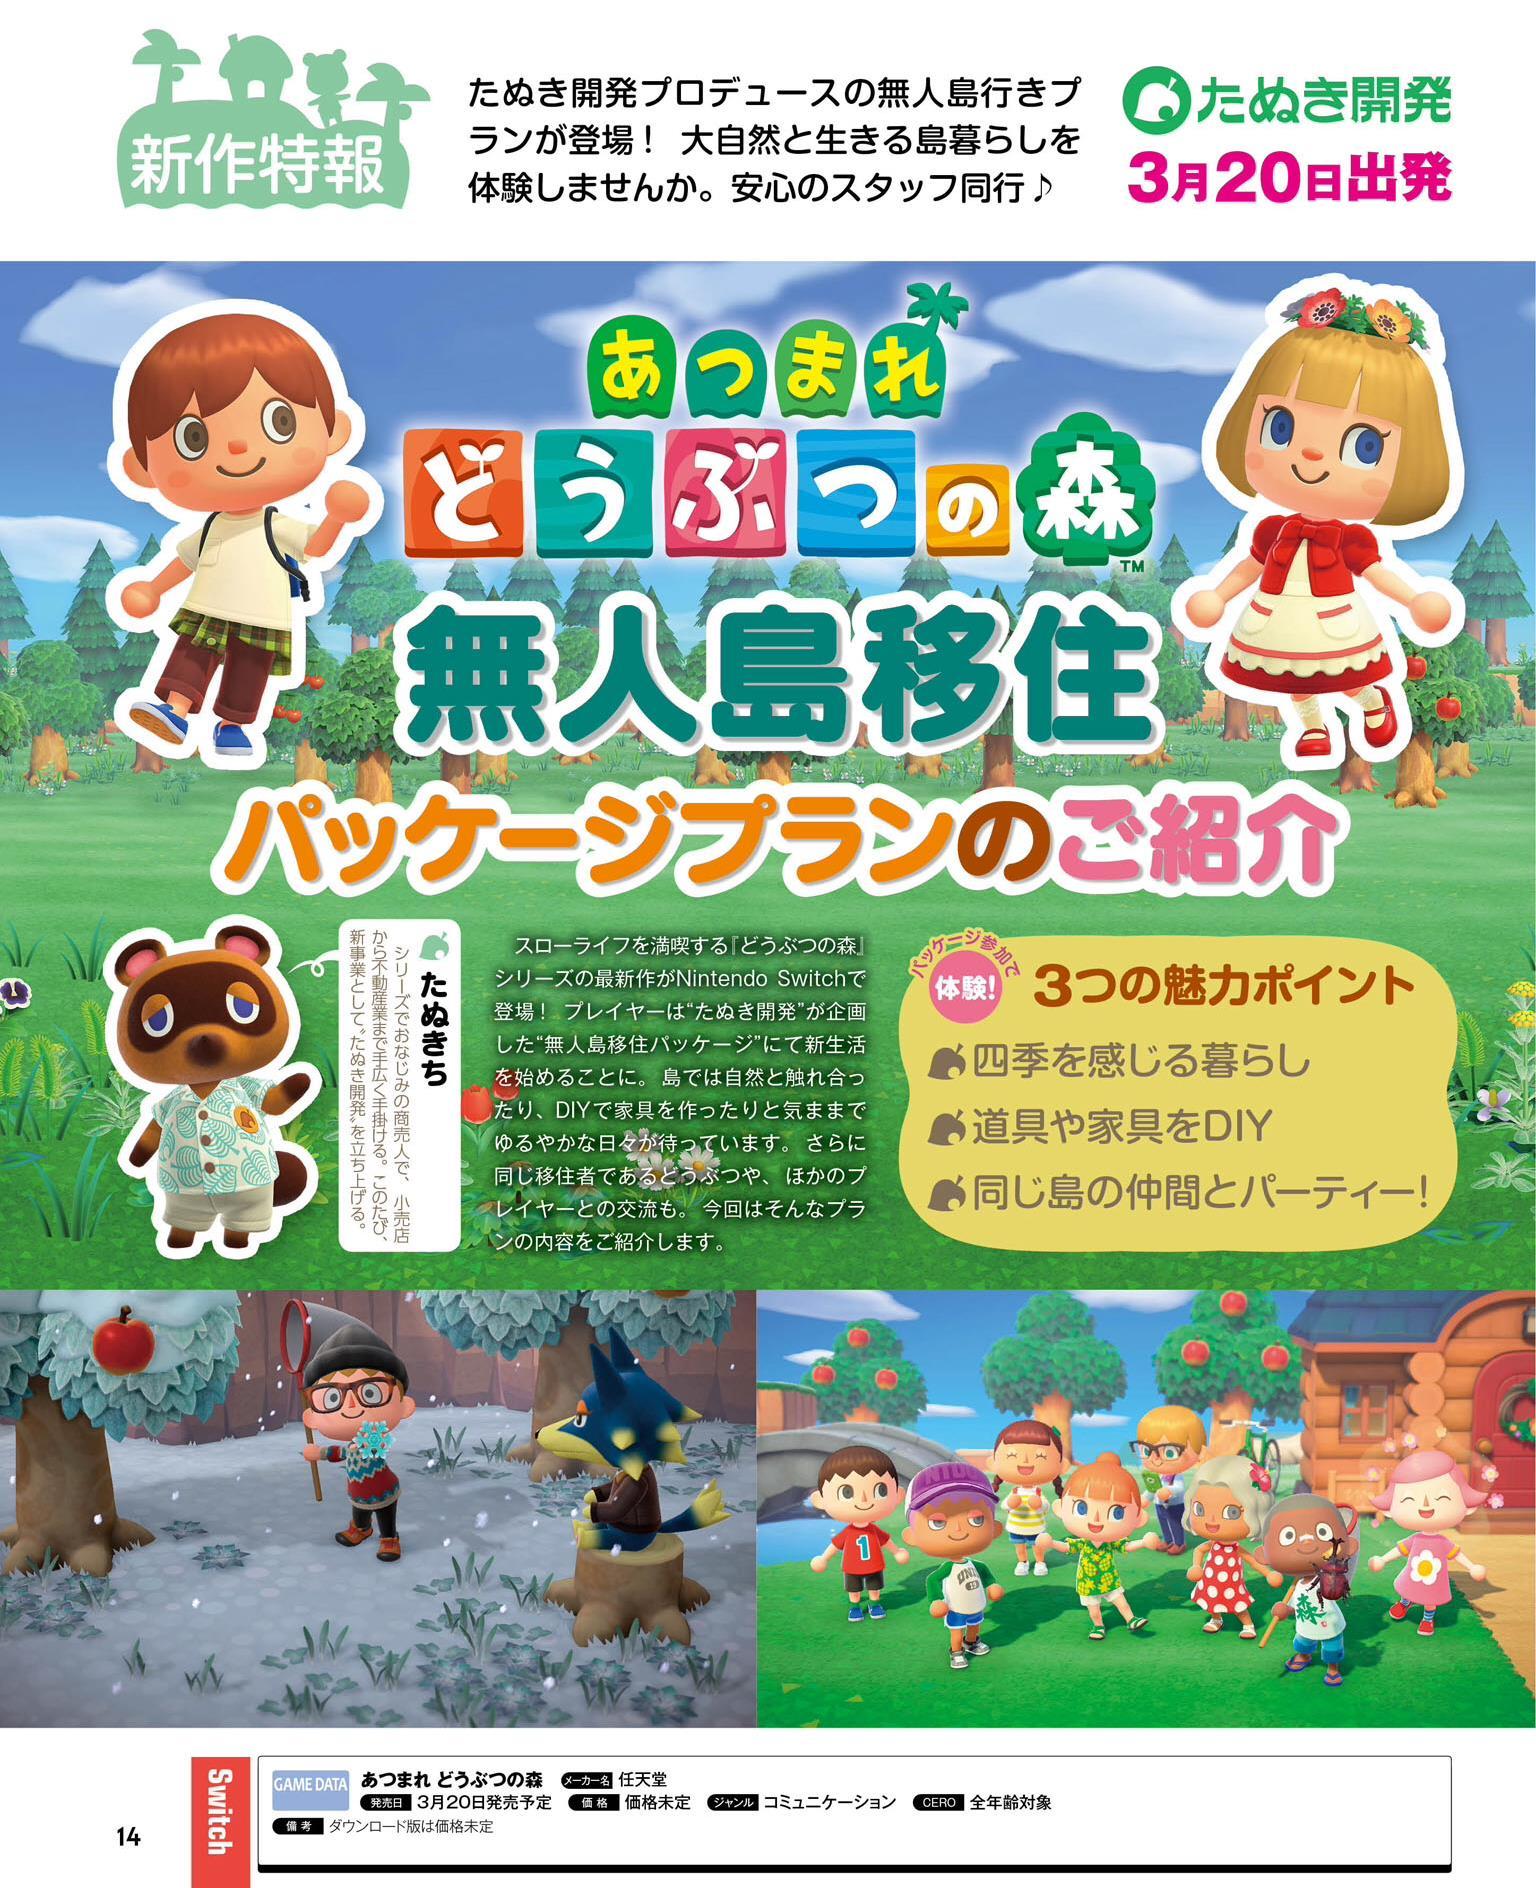 Scans Roundup Animal Crossing New Horizons Persona 5 Scramble More Nintendo Everything